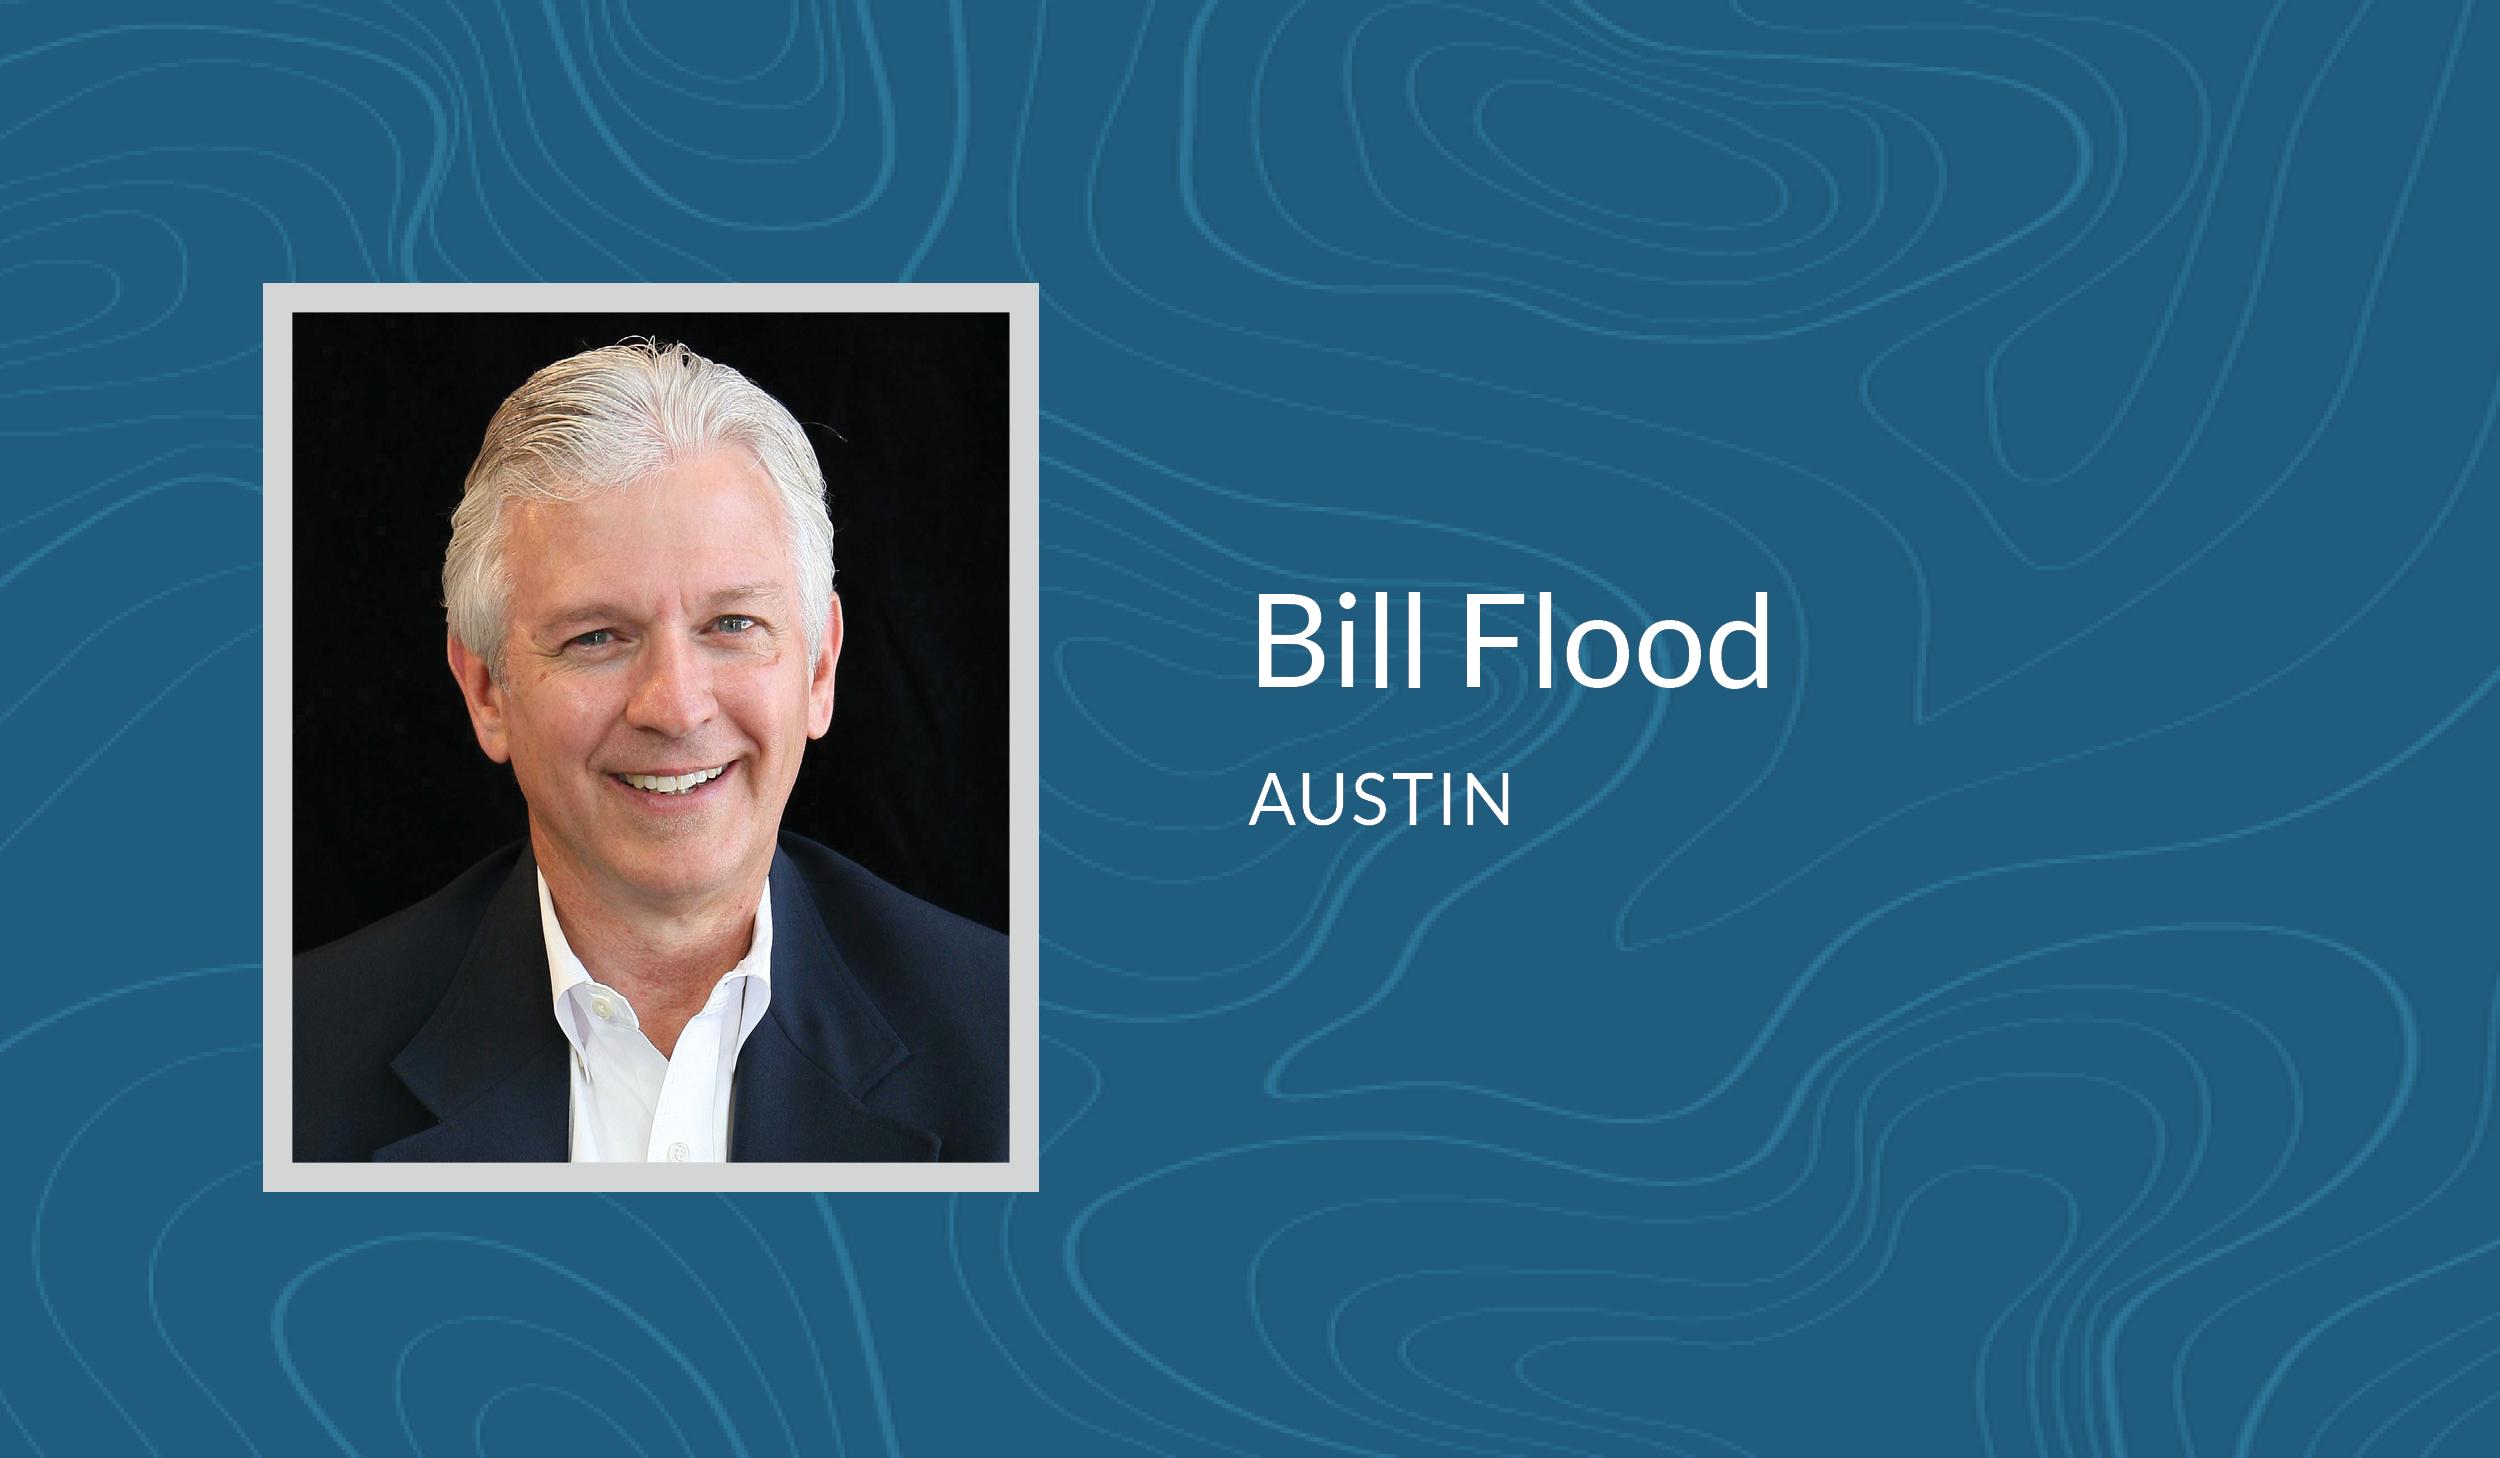 Bill Flood Landing Page Headers.png